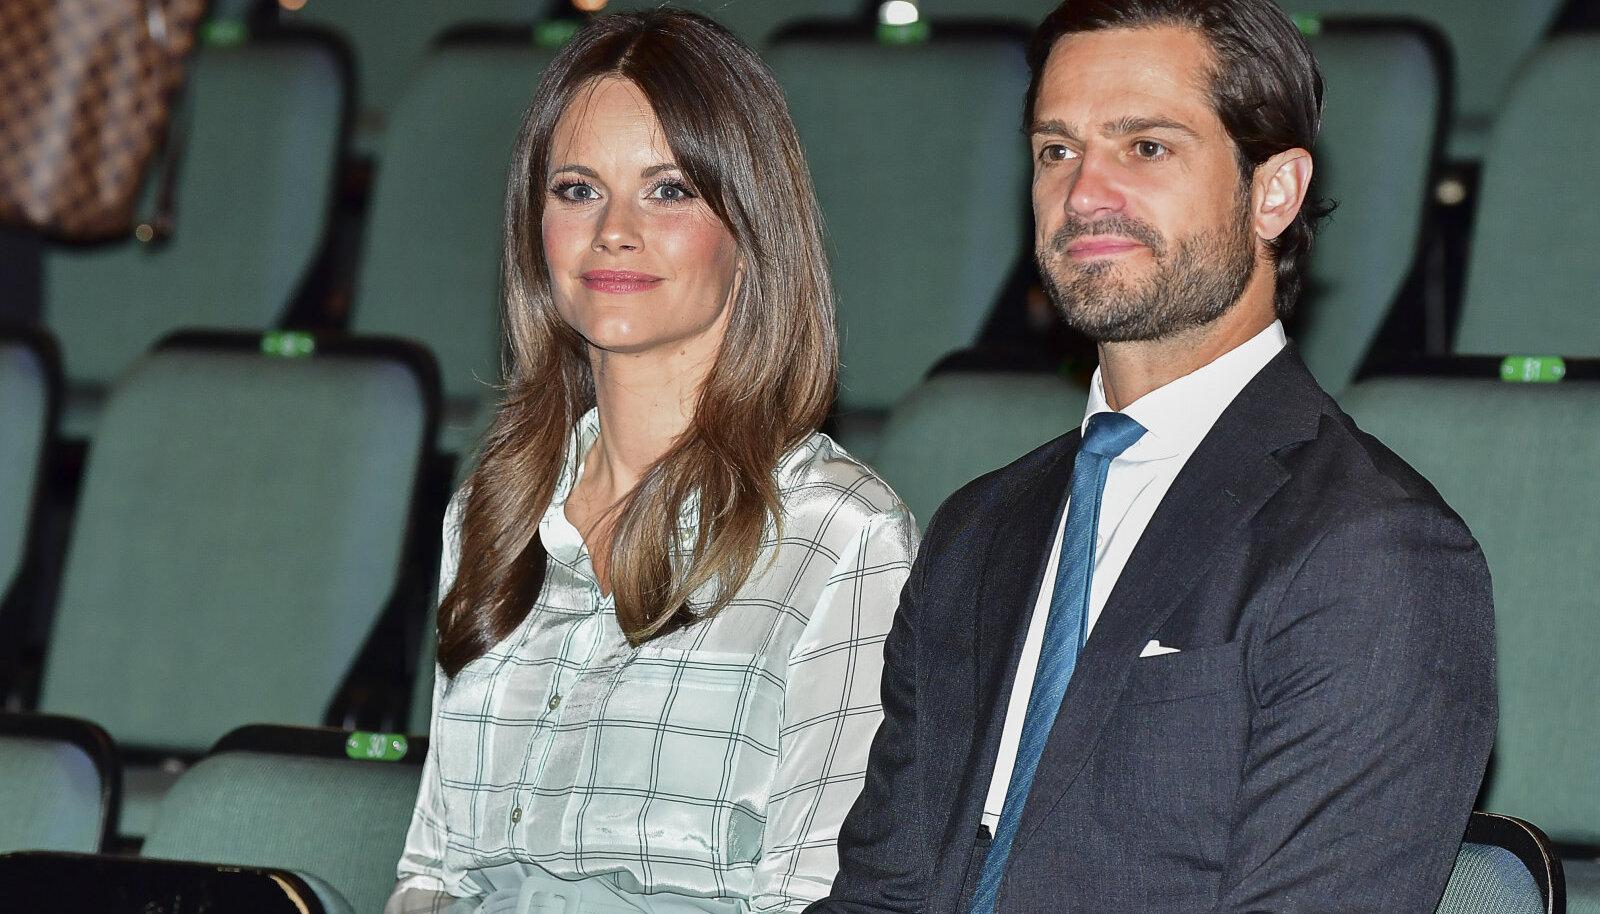 Rootsi prints Carl Philip ja printsess Sofia